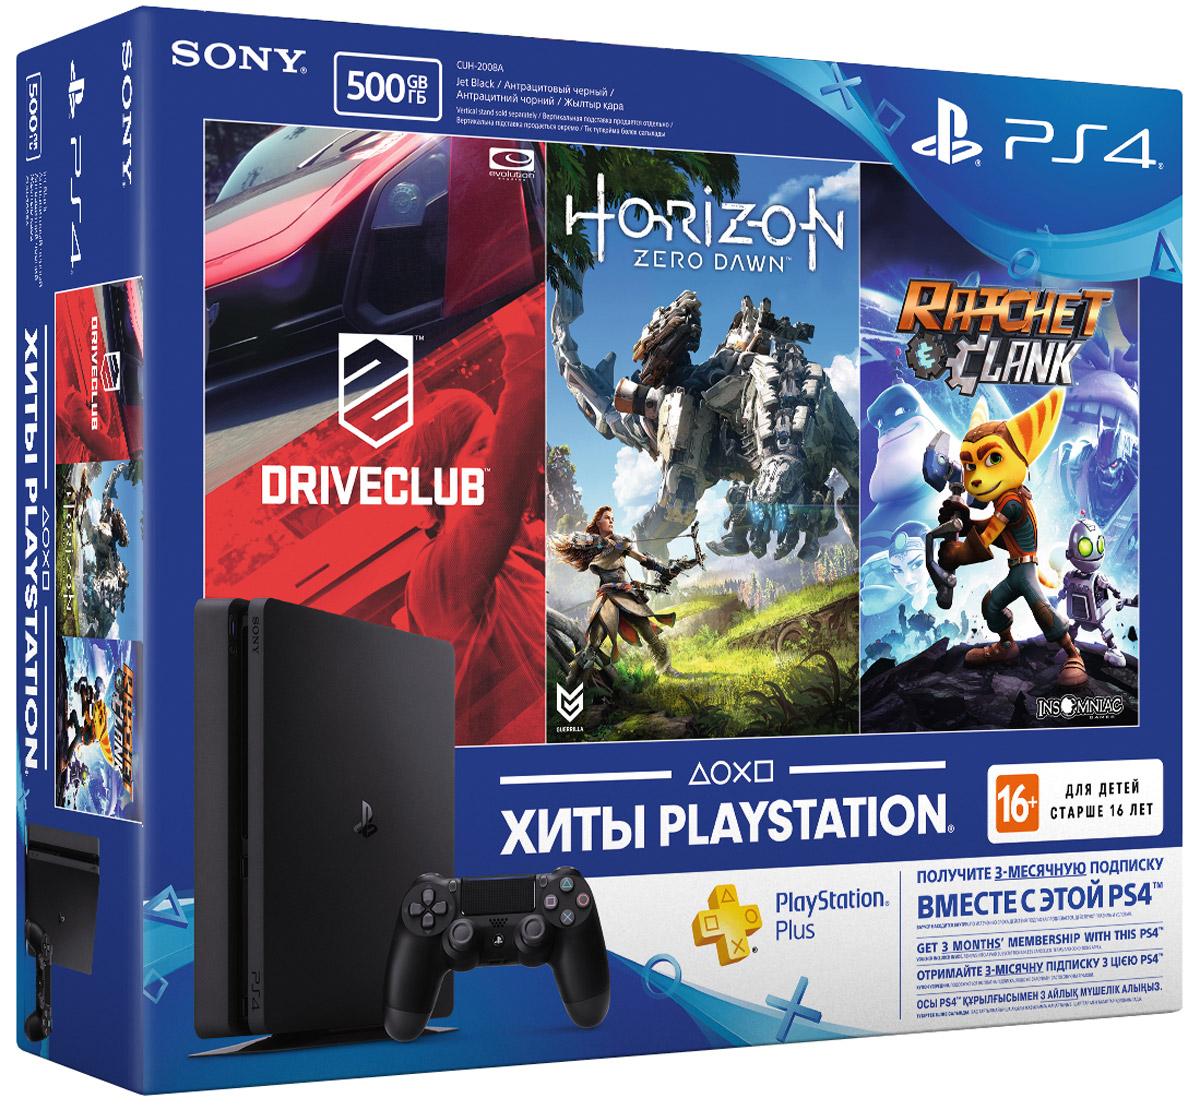 Игровая приставка Sony PlayStation 4 Slim (500 GB) + Driveclub + Horizon Zero Dawn + Ratchet & Clank